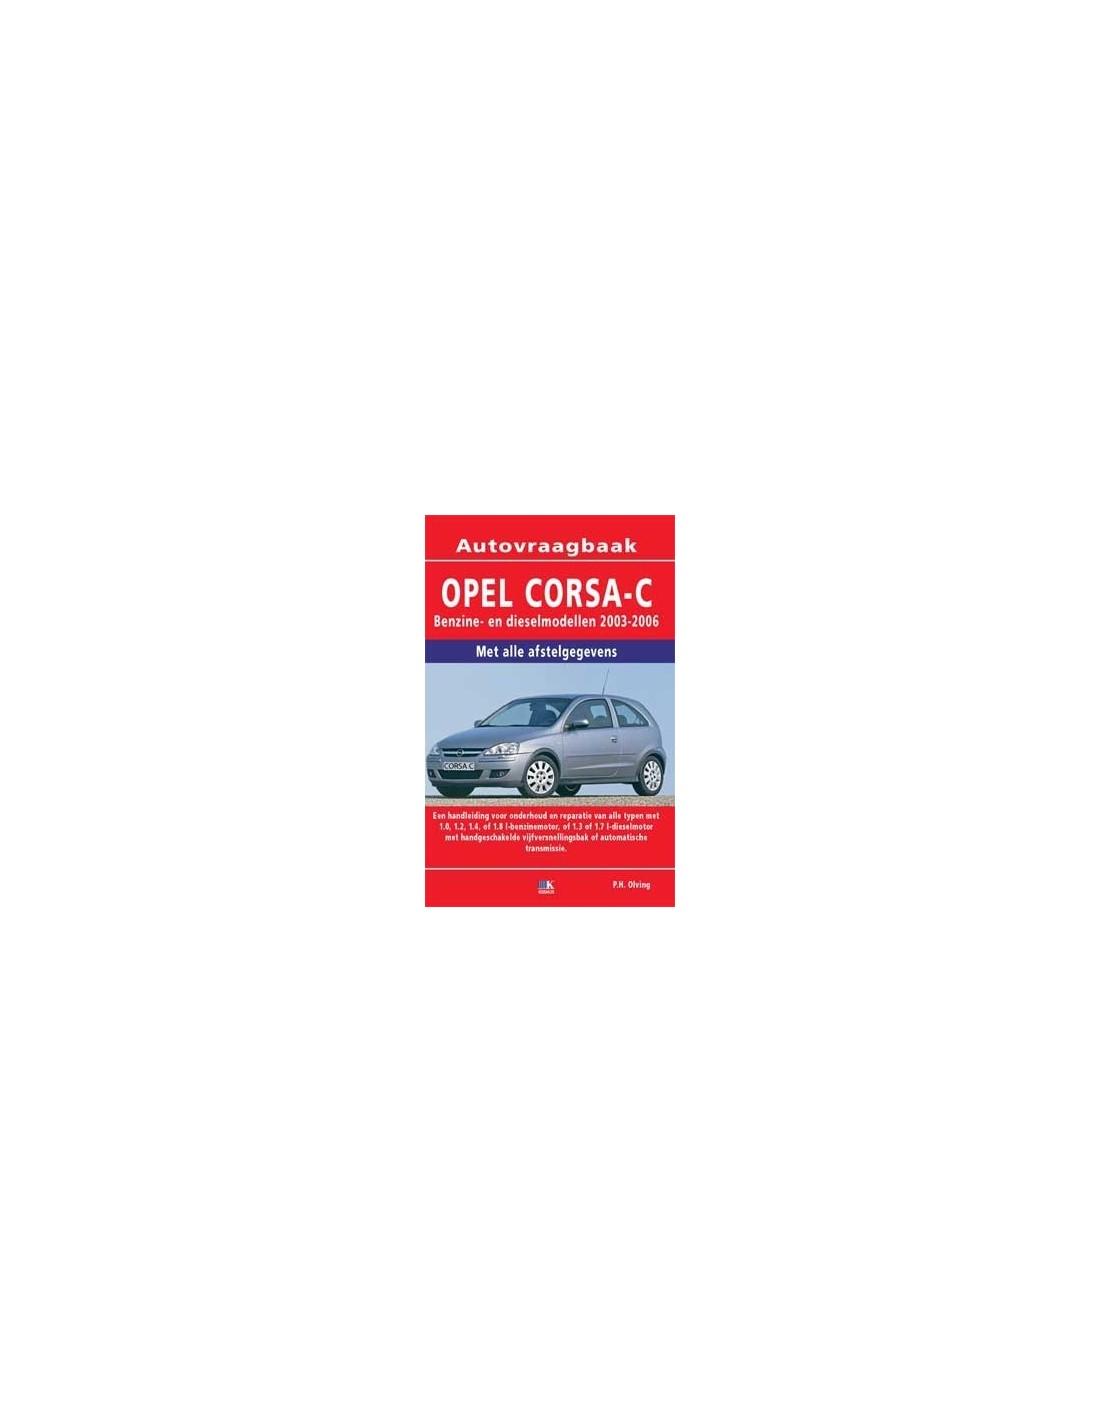 2003 2006 opel corsa c workshop manual dutch rh autolit eu manual opel corsa c 2003 manual opel corsa 2003 pdf